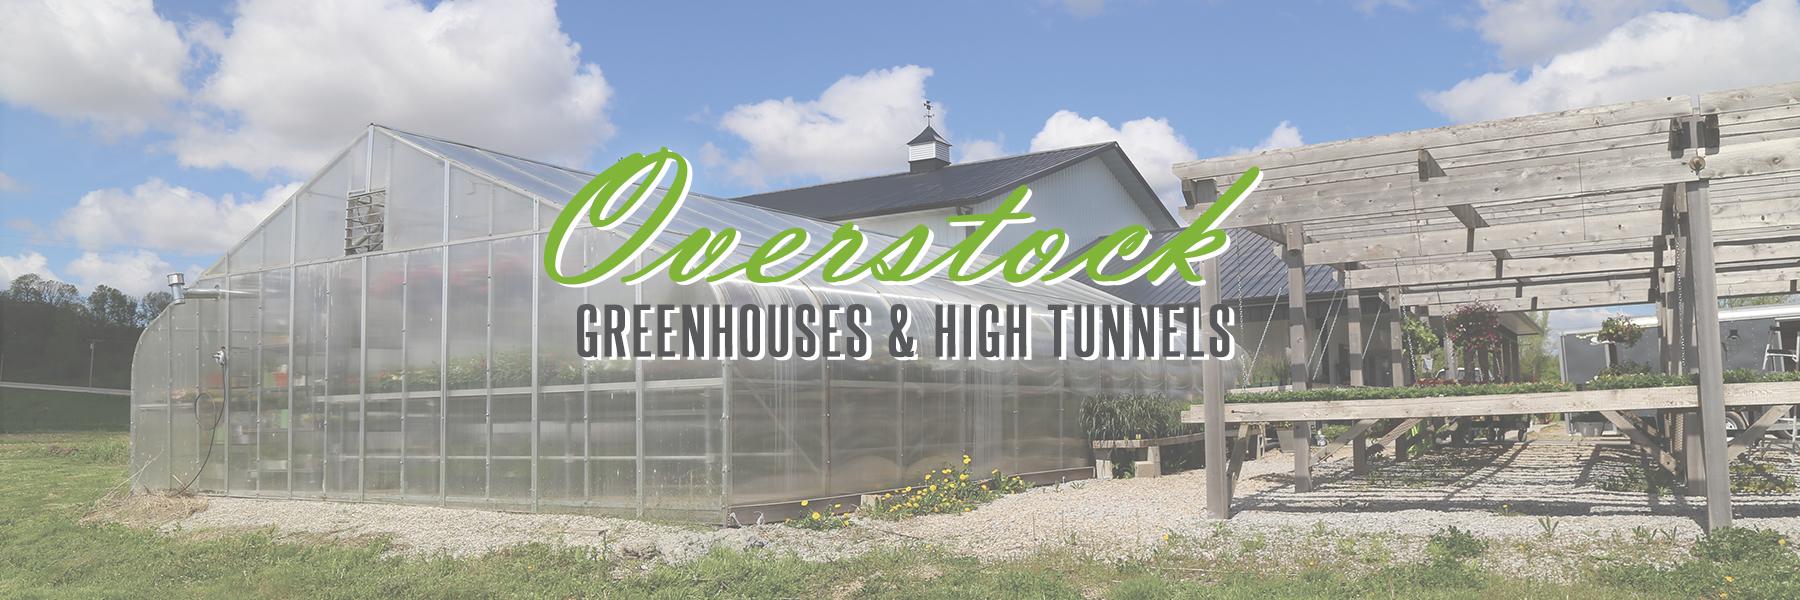 Overstock Greenhouses